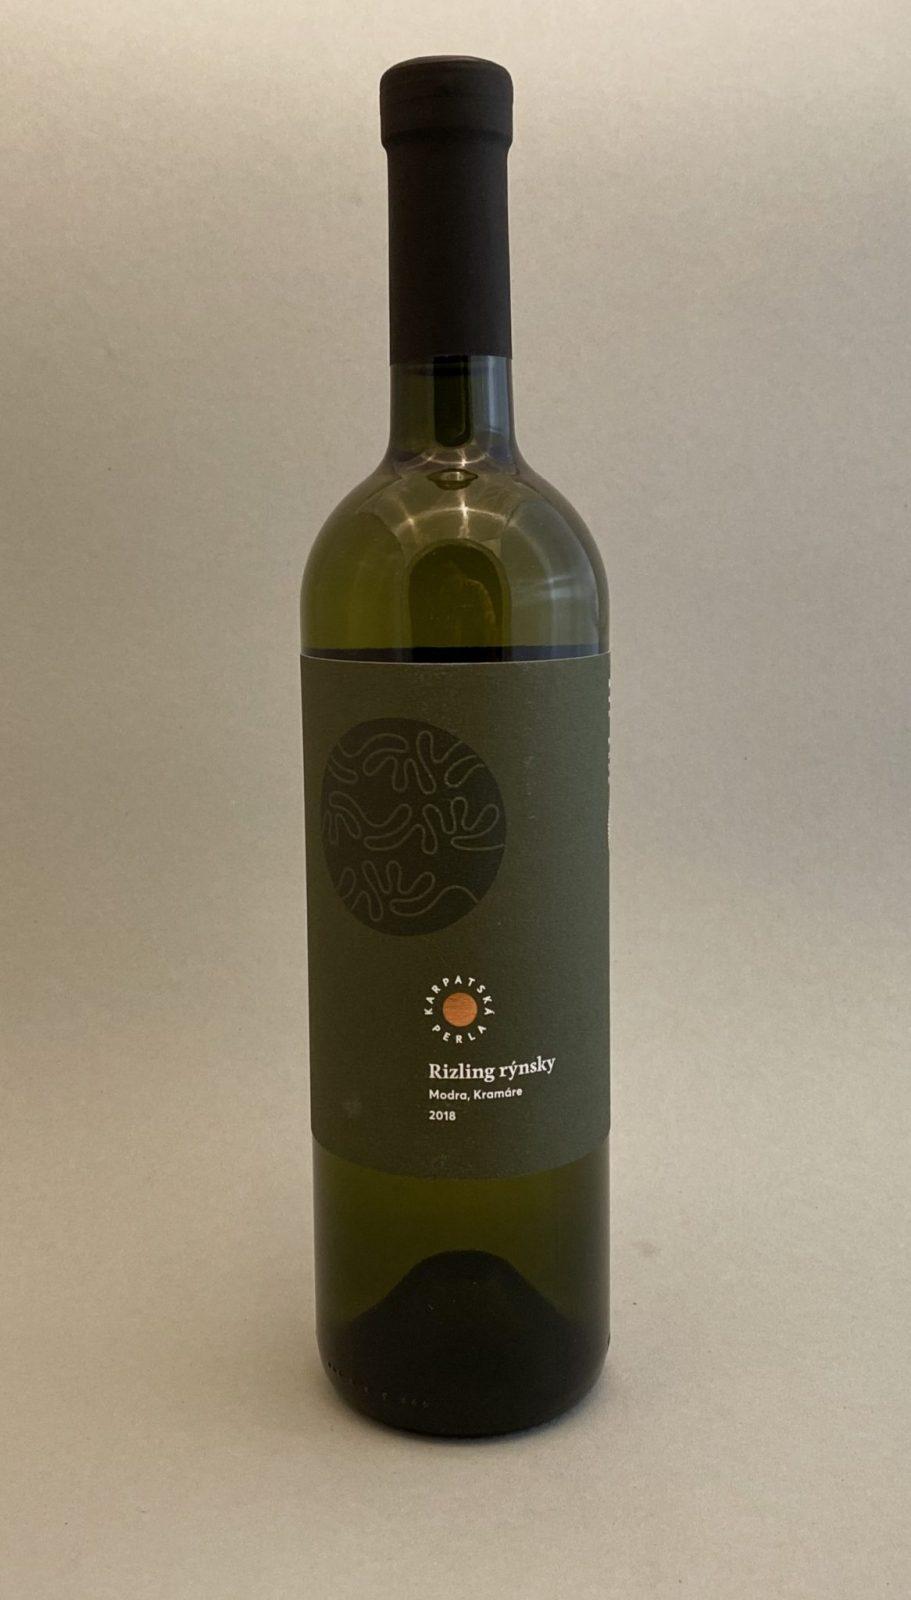 KARPATSKÁ PERLA Rizling Rýnsky 2018, vinotéka v Slnečniciach, slovenské biele víno, Bratislava Petržalka, Sunny Wines